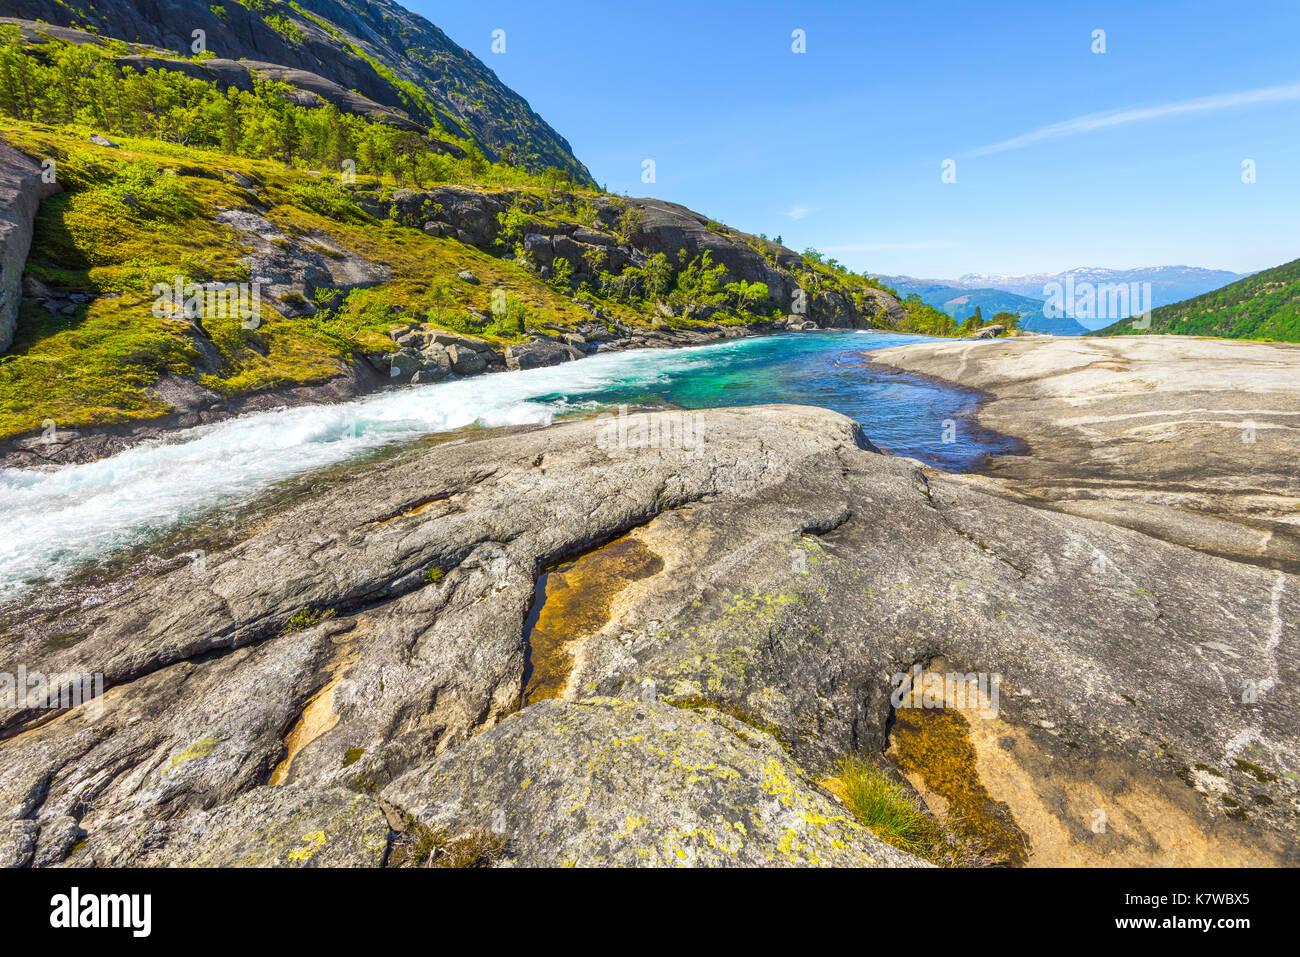 Nykkjesoyfossen falls in the Husedalen valley, near Kinsarvik, view to Hardangerfjord, Norway, Scandinavia Stock Photo